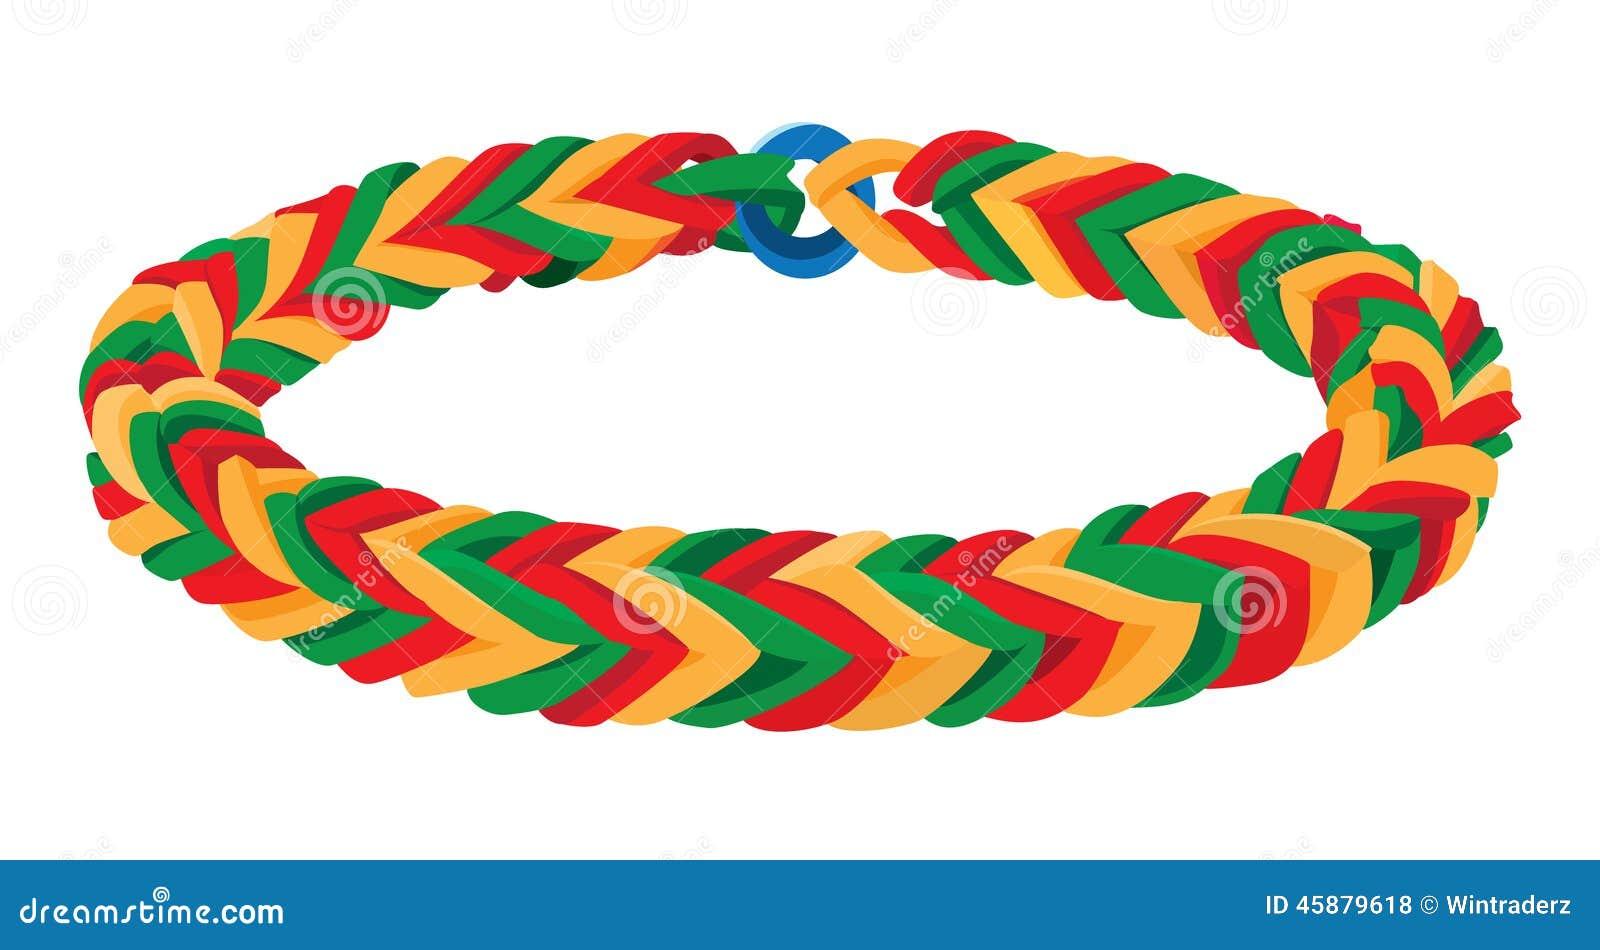 Band Bracelet Rubber